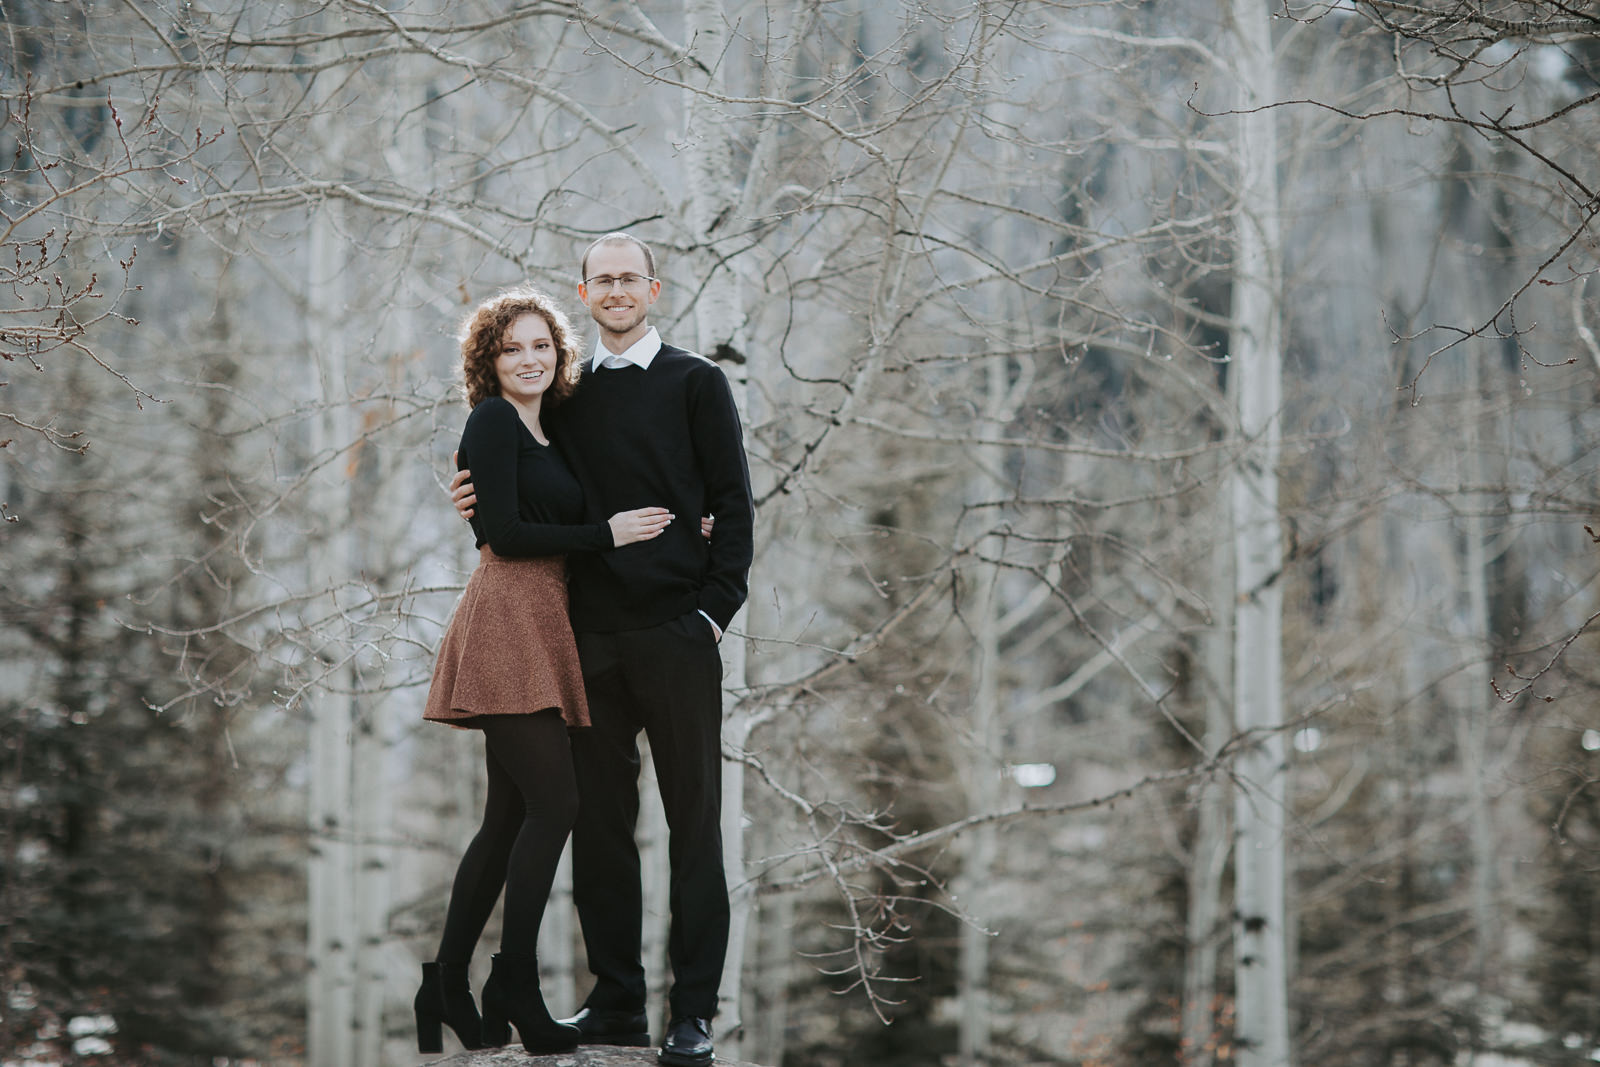 Vail Colorado Engagement Aspen Trees